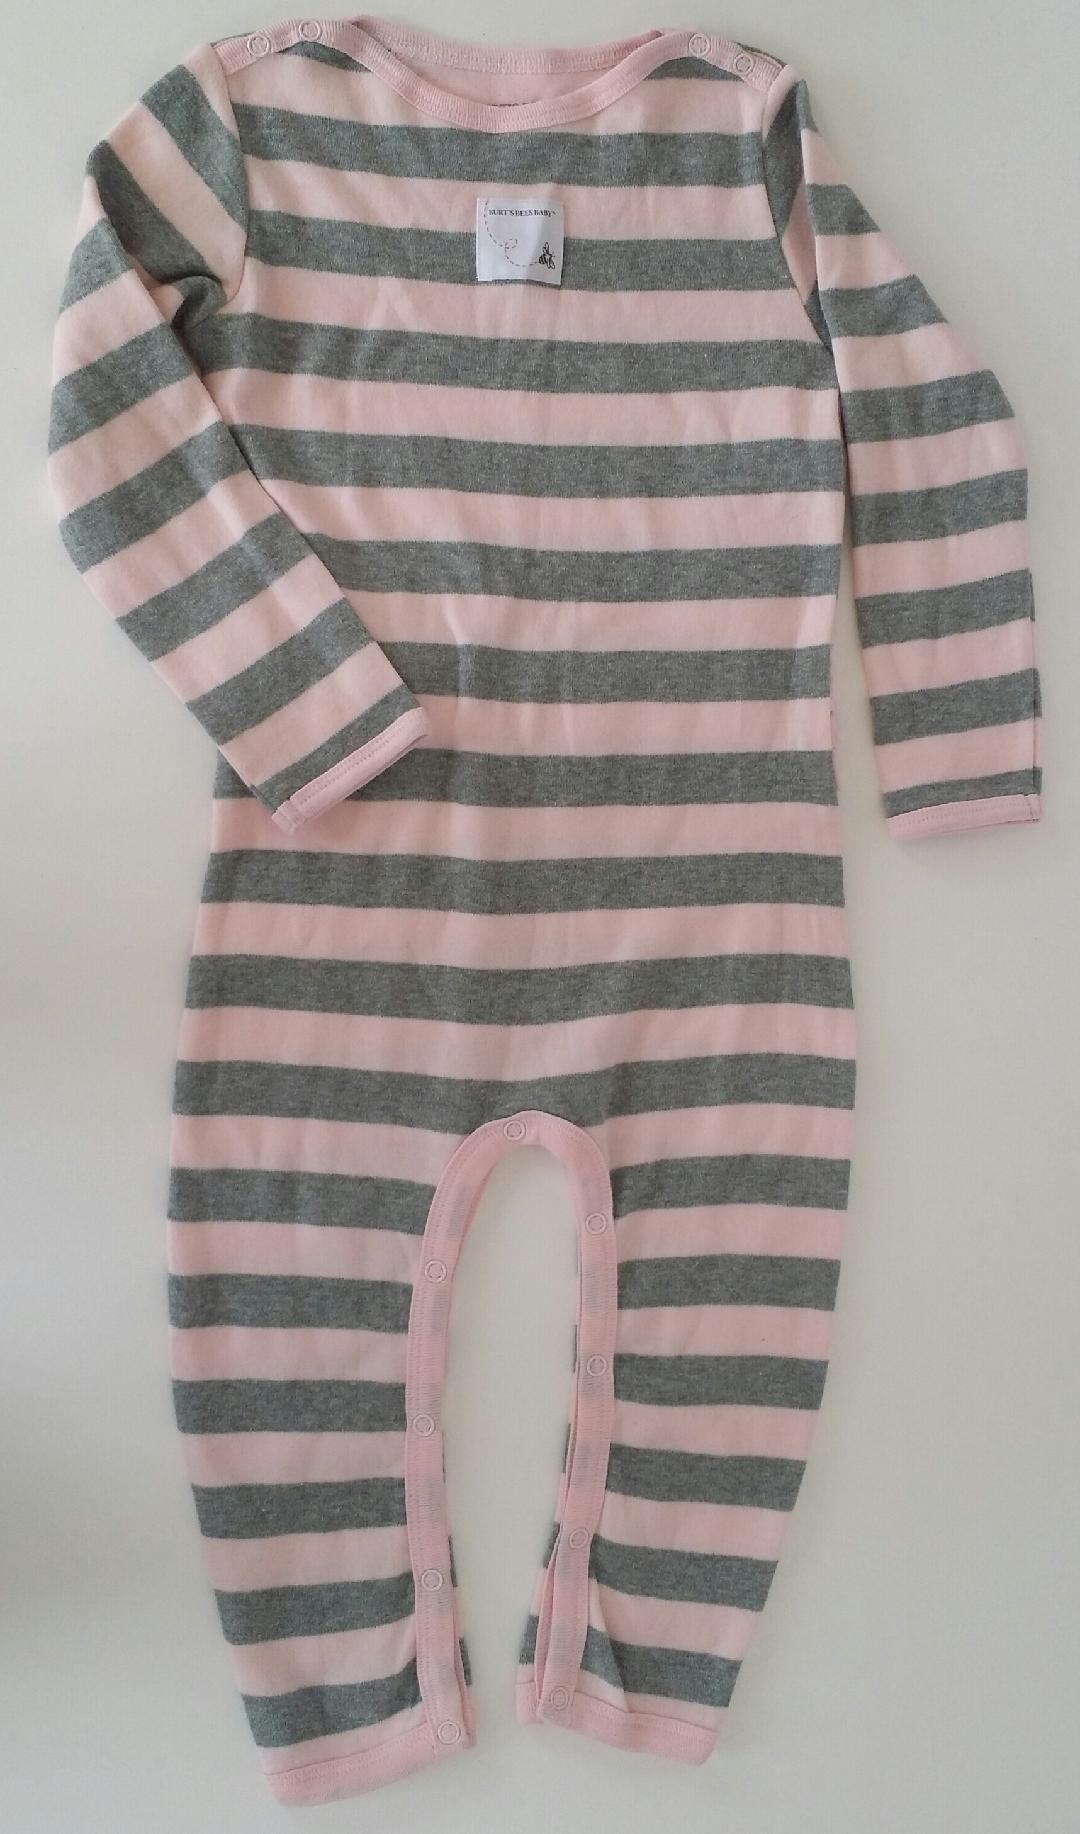 Burts-Bees-Baby--18-24-MONTHS-Striped-Organic-Cotton-Romper_2024022A.jpg